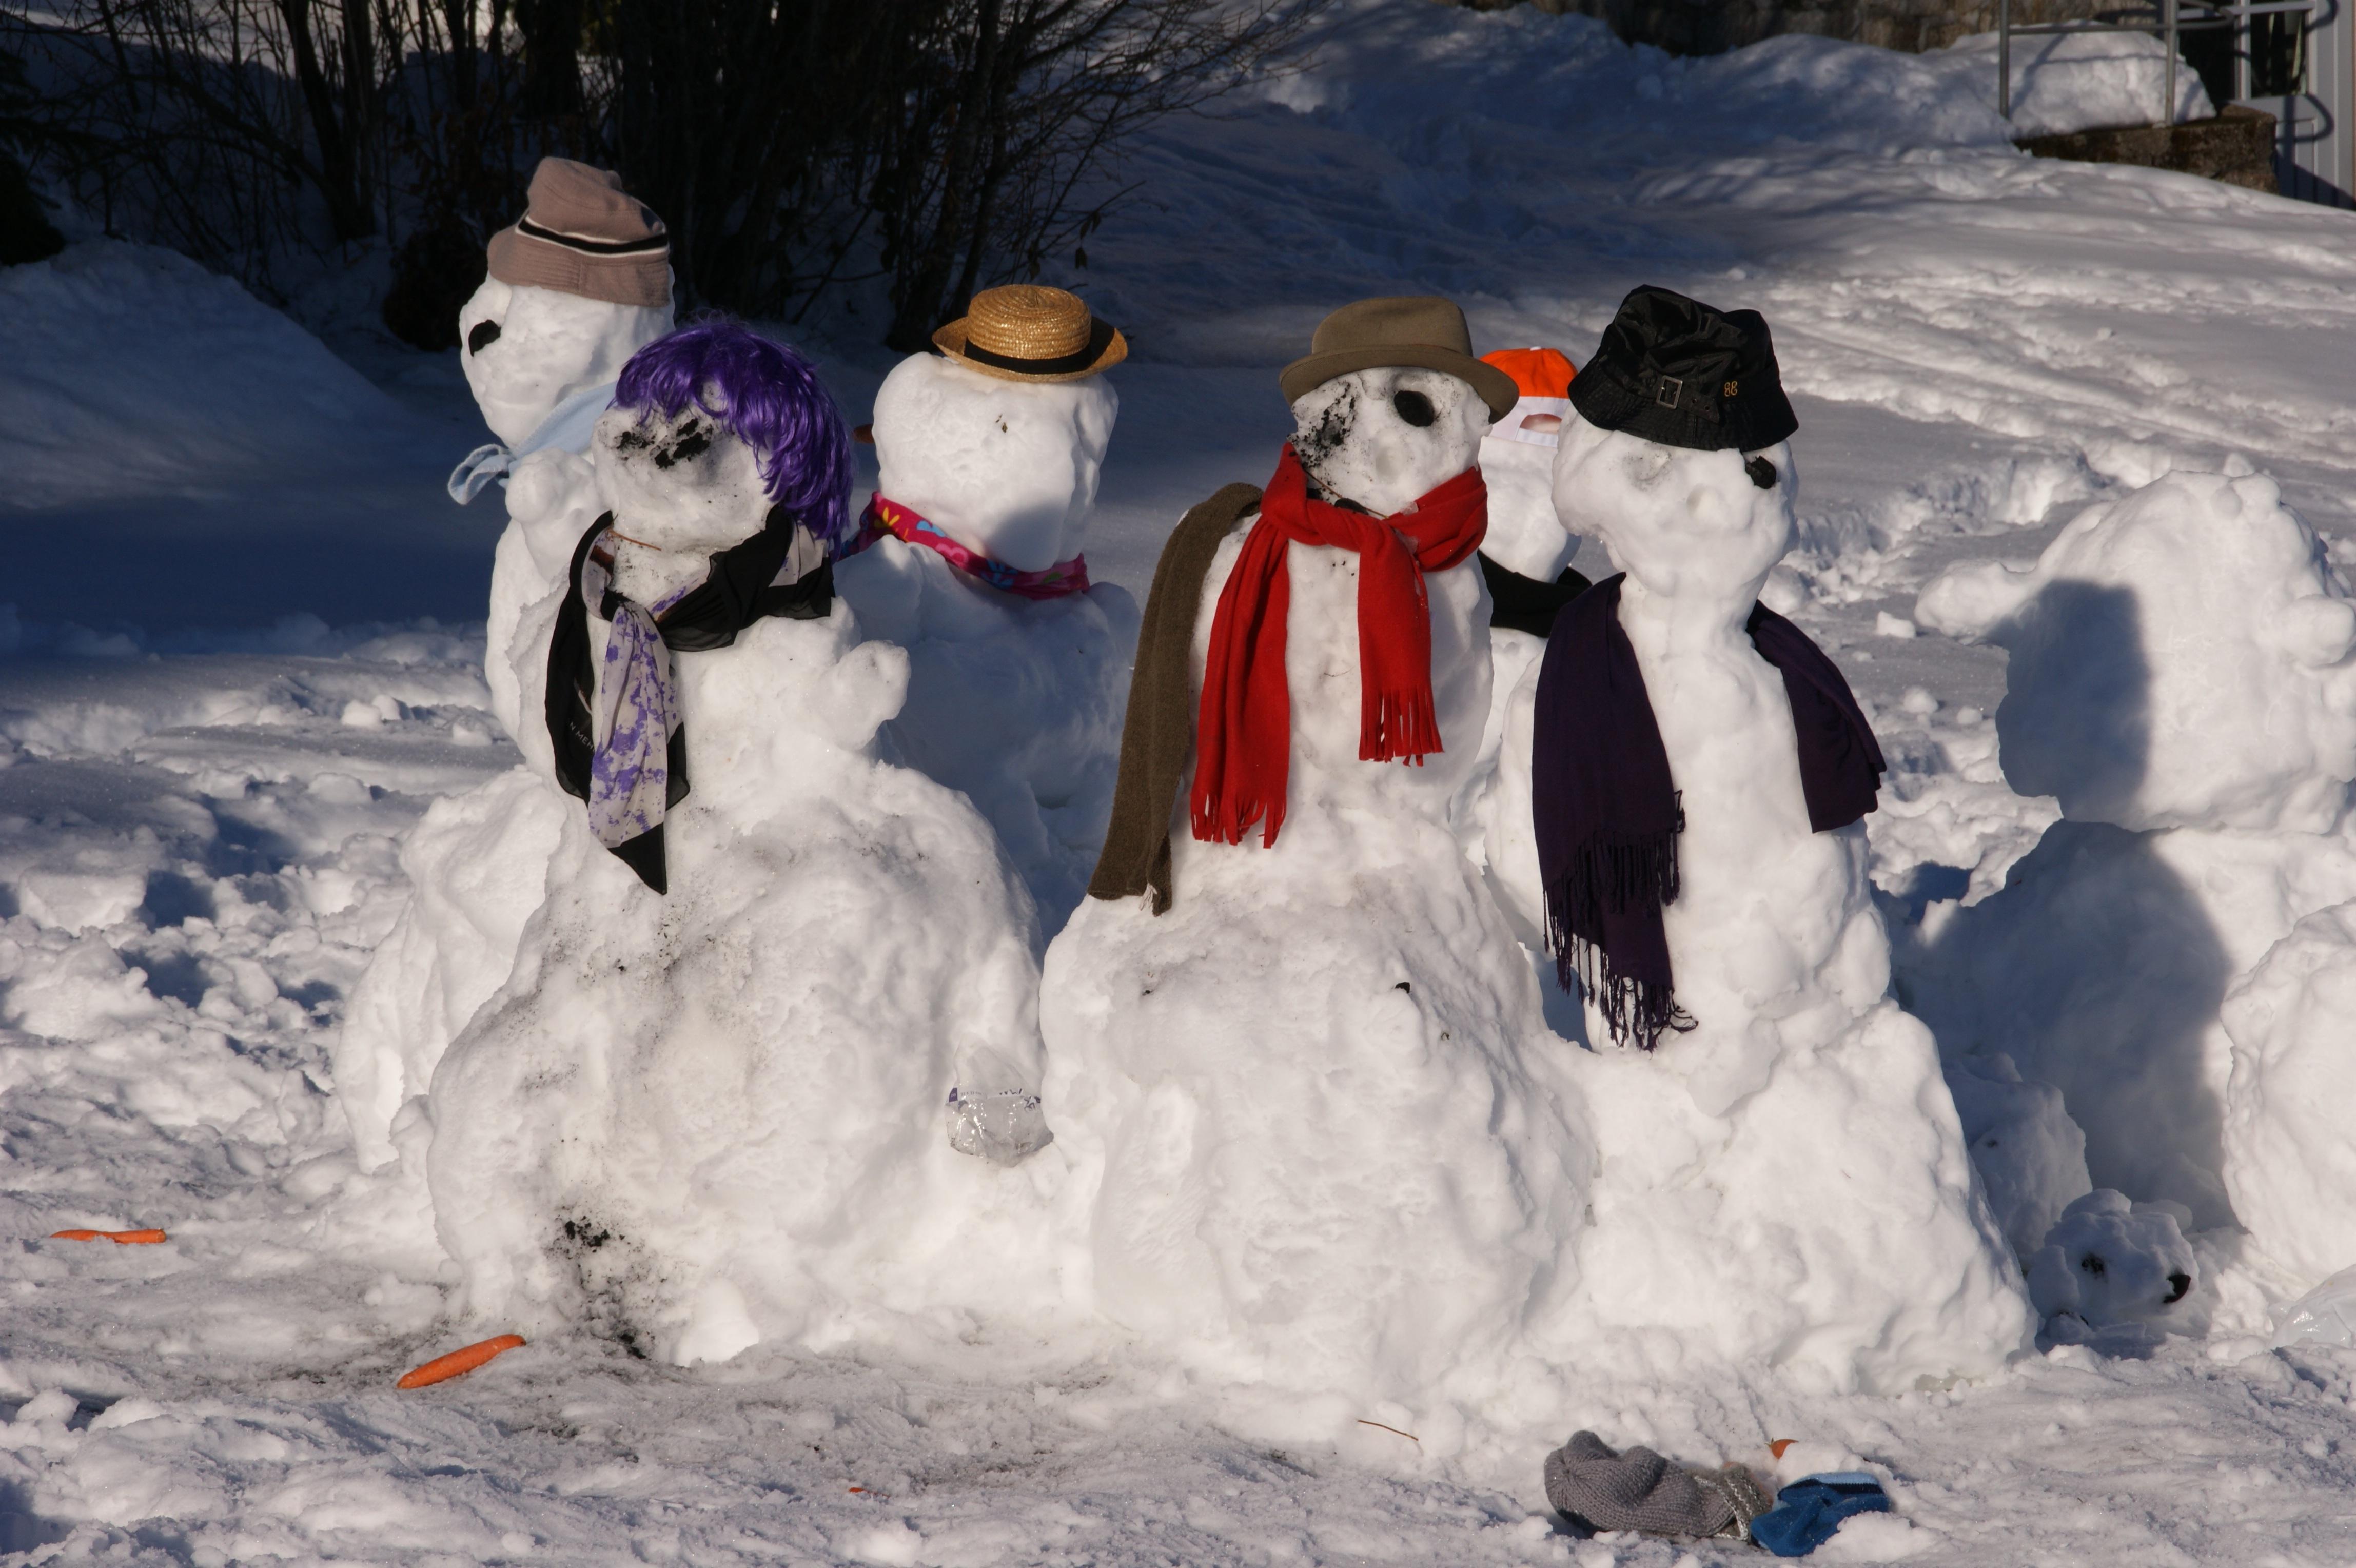 Картинки и фото веселые снеговиков